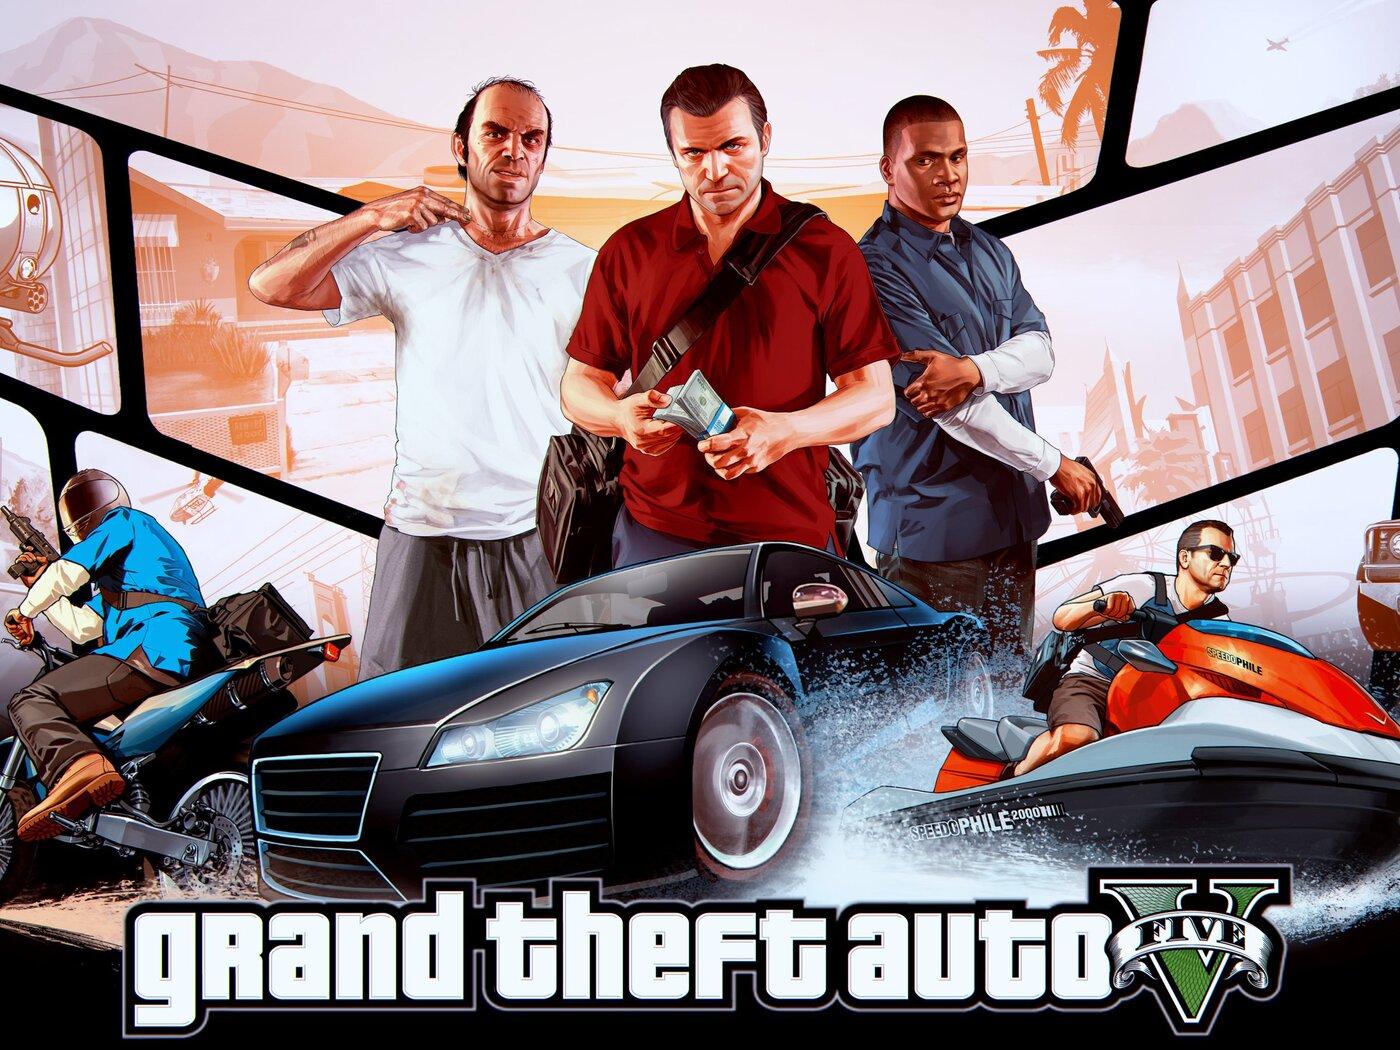 grand-theft-auto-v-hd.jpg